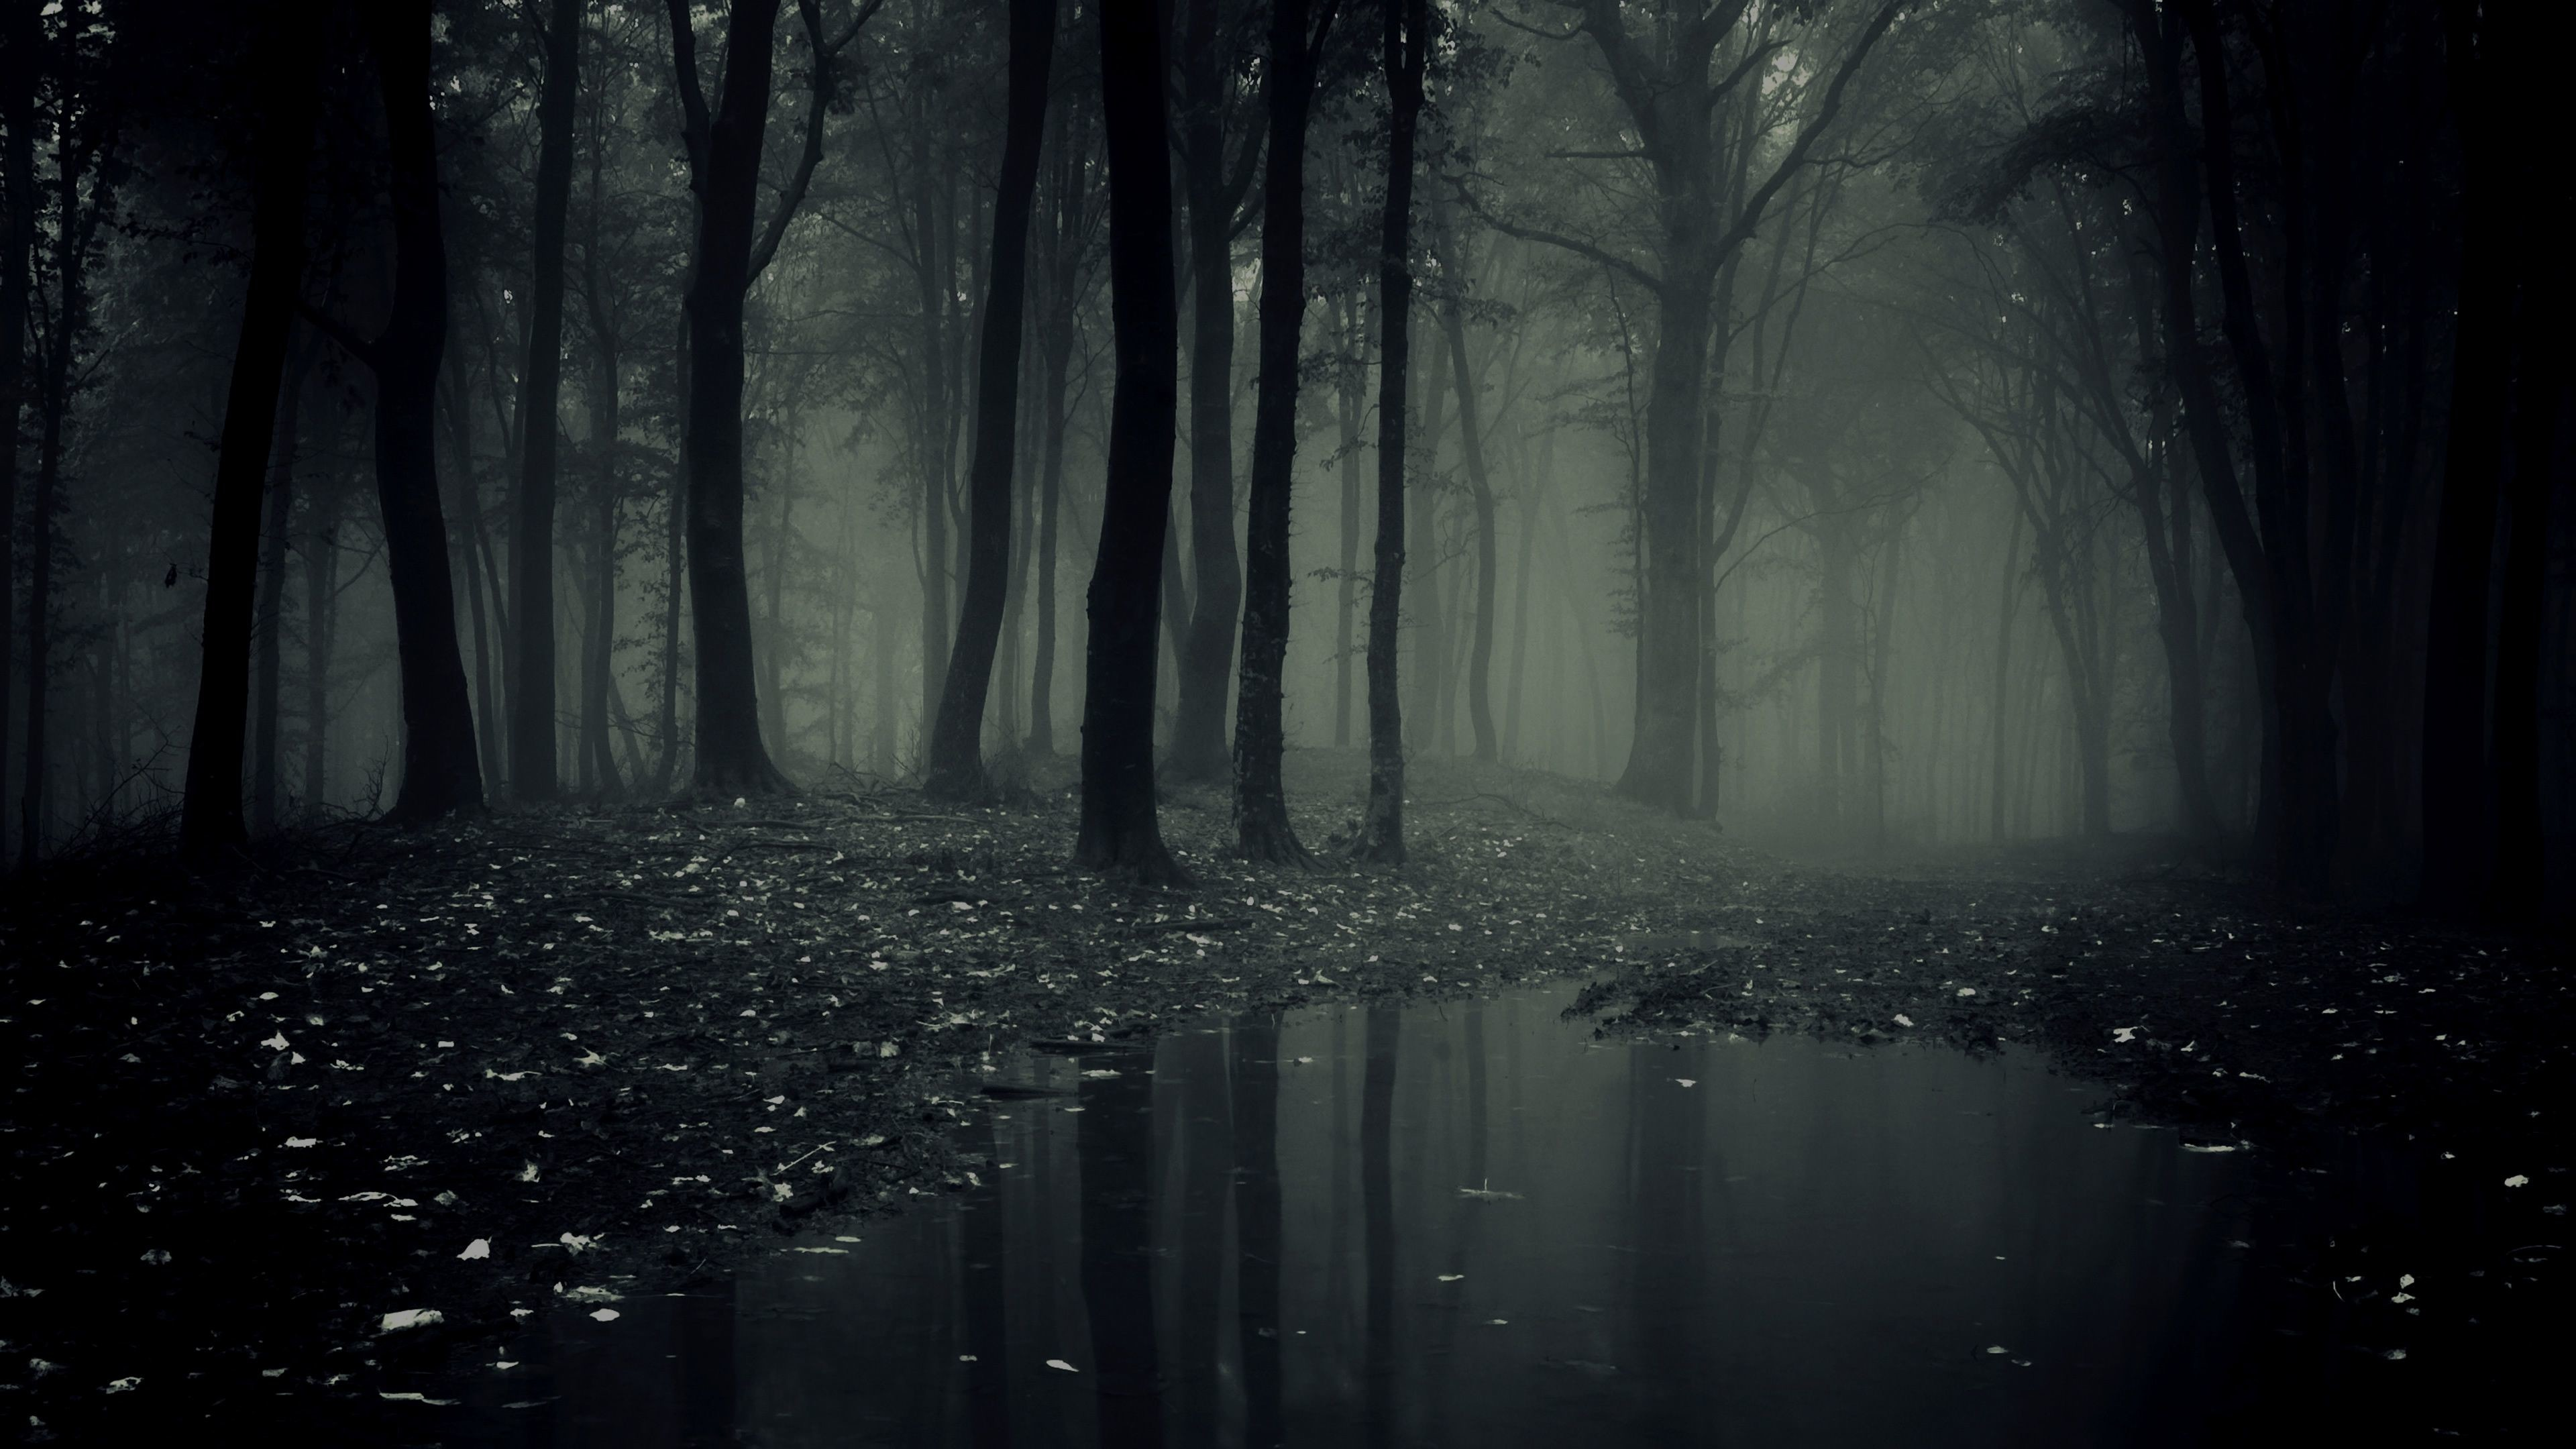 Res: 3840x2160, Dark Forest Wallpaper For Mac #pnu